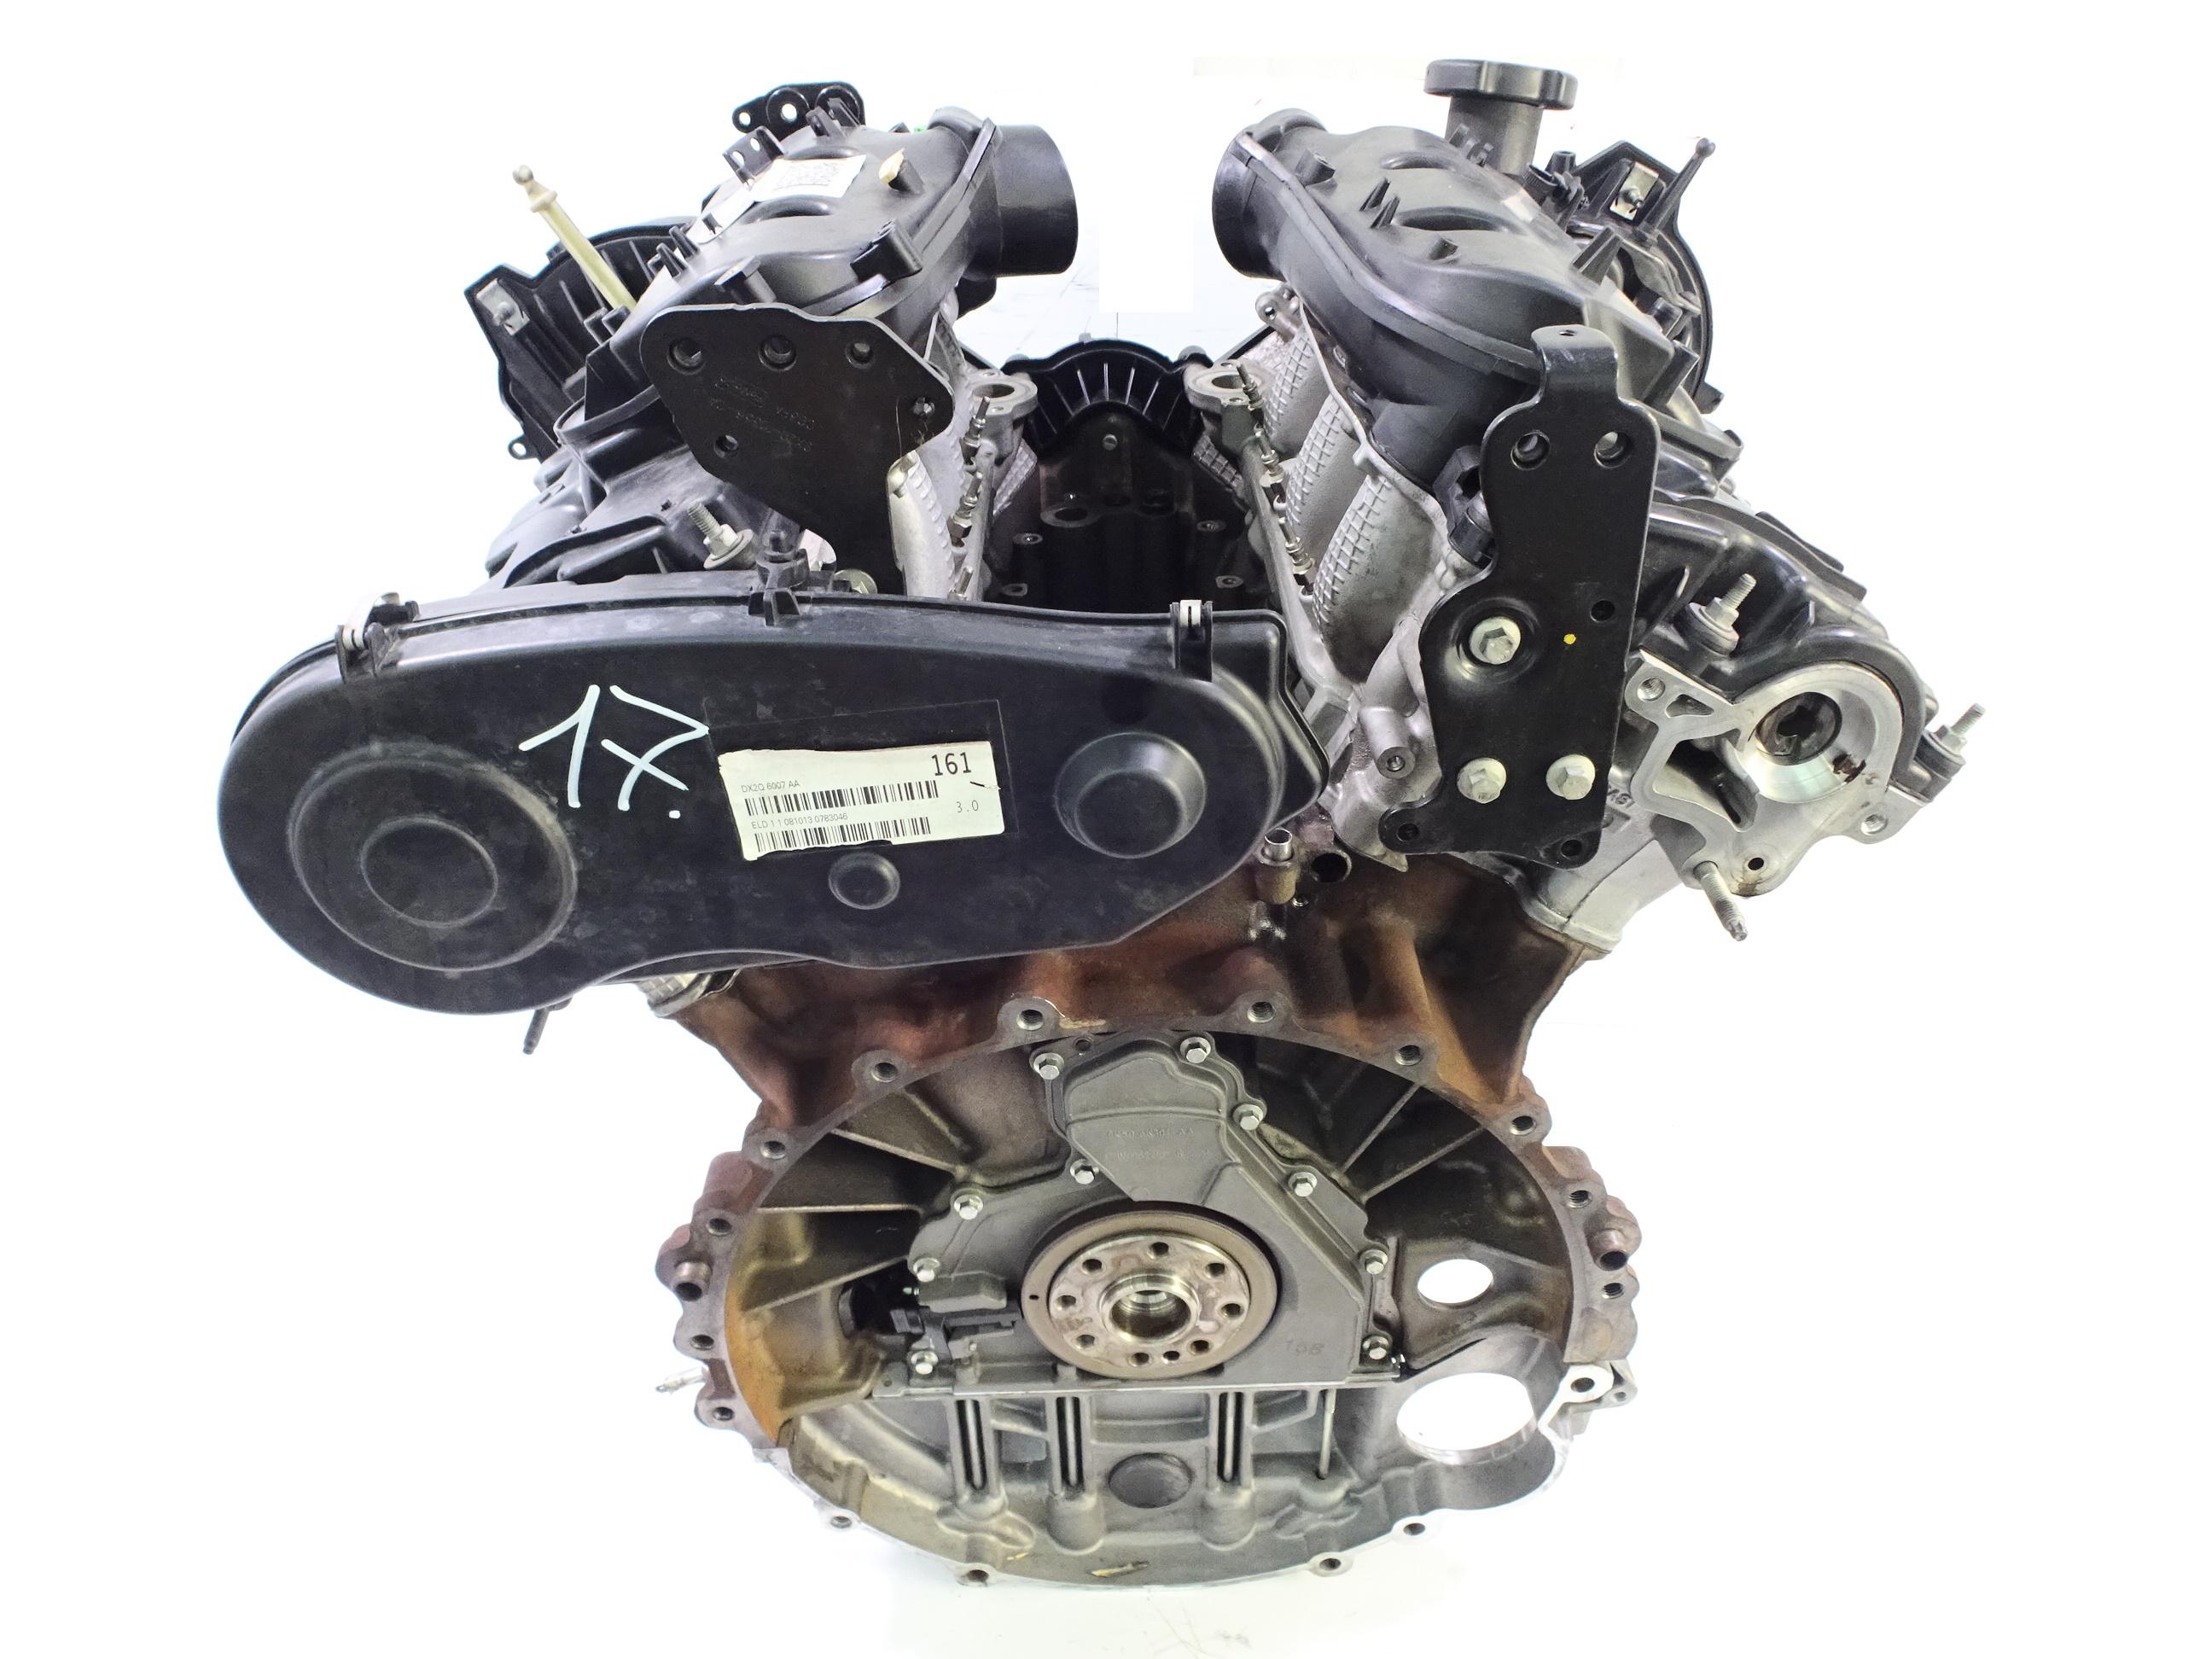 Motor 2014 Jaguar XF X250 Land Rover 3,0 D Diesel 306DT | eBay